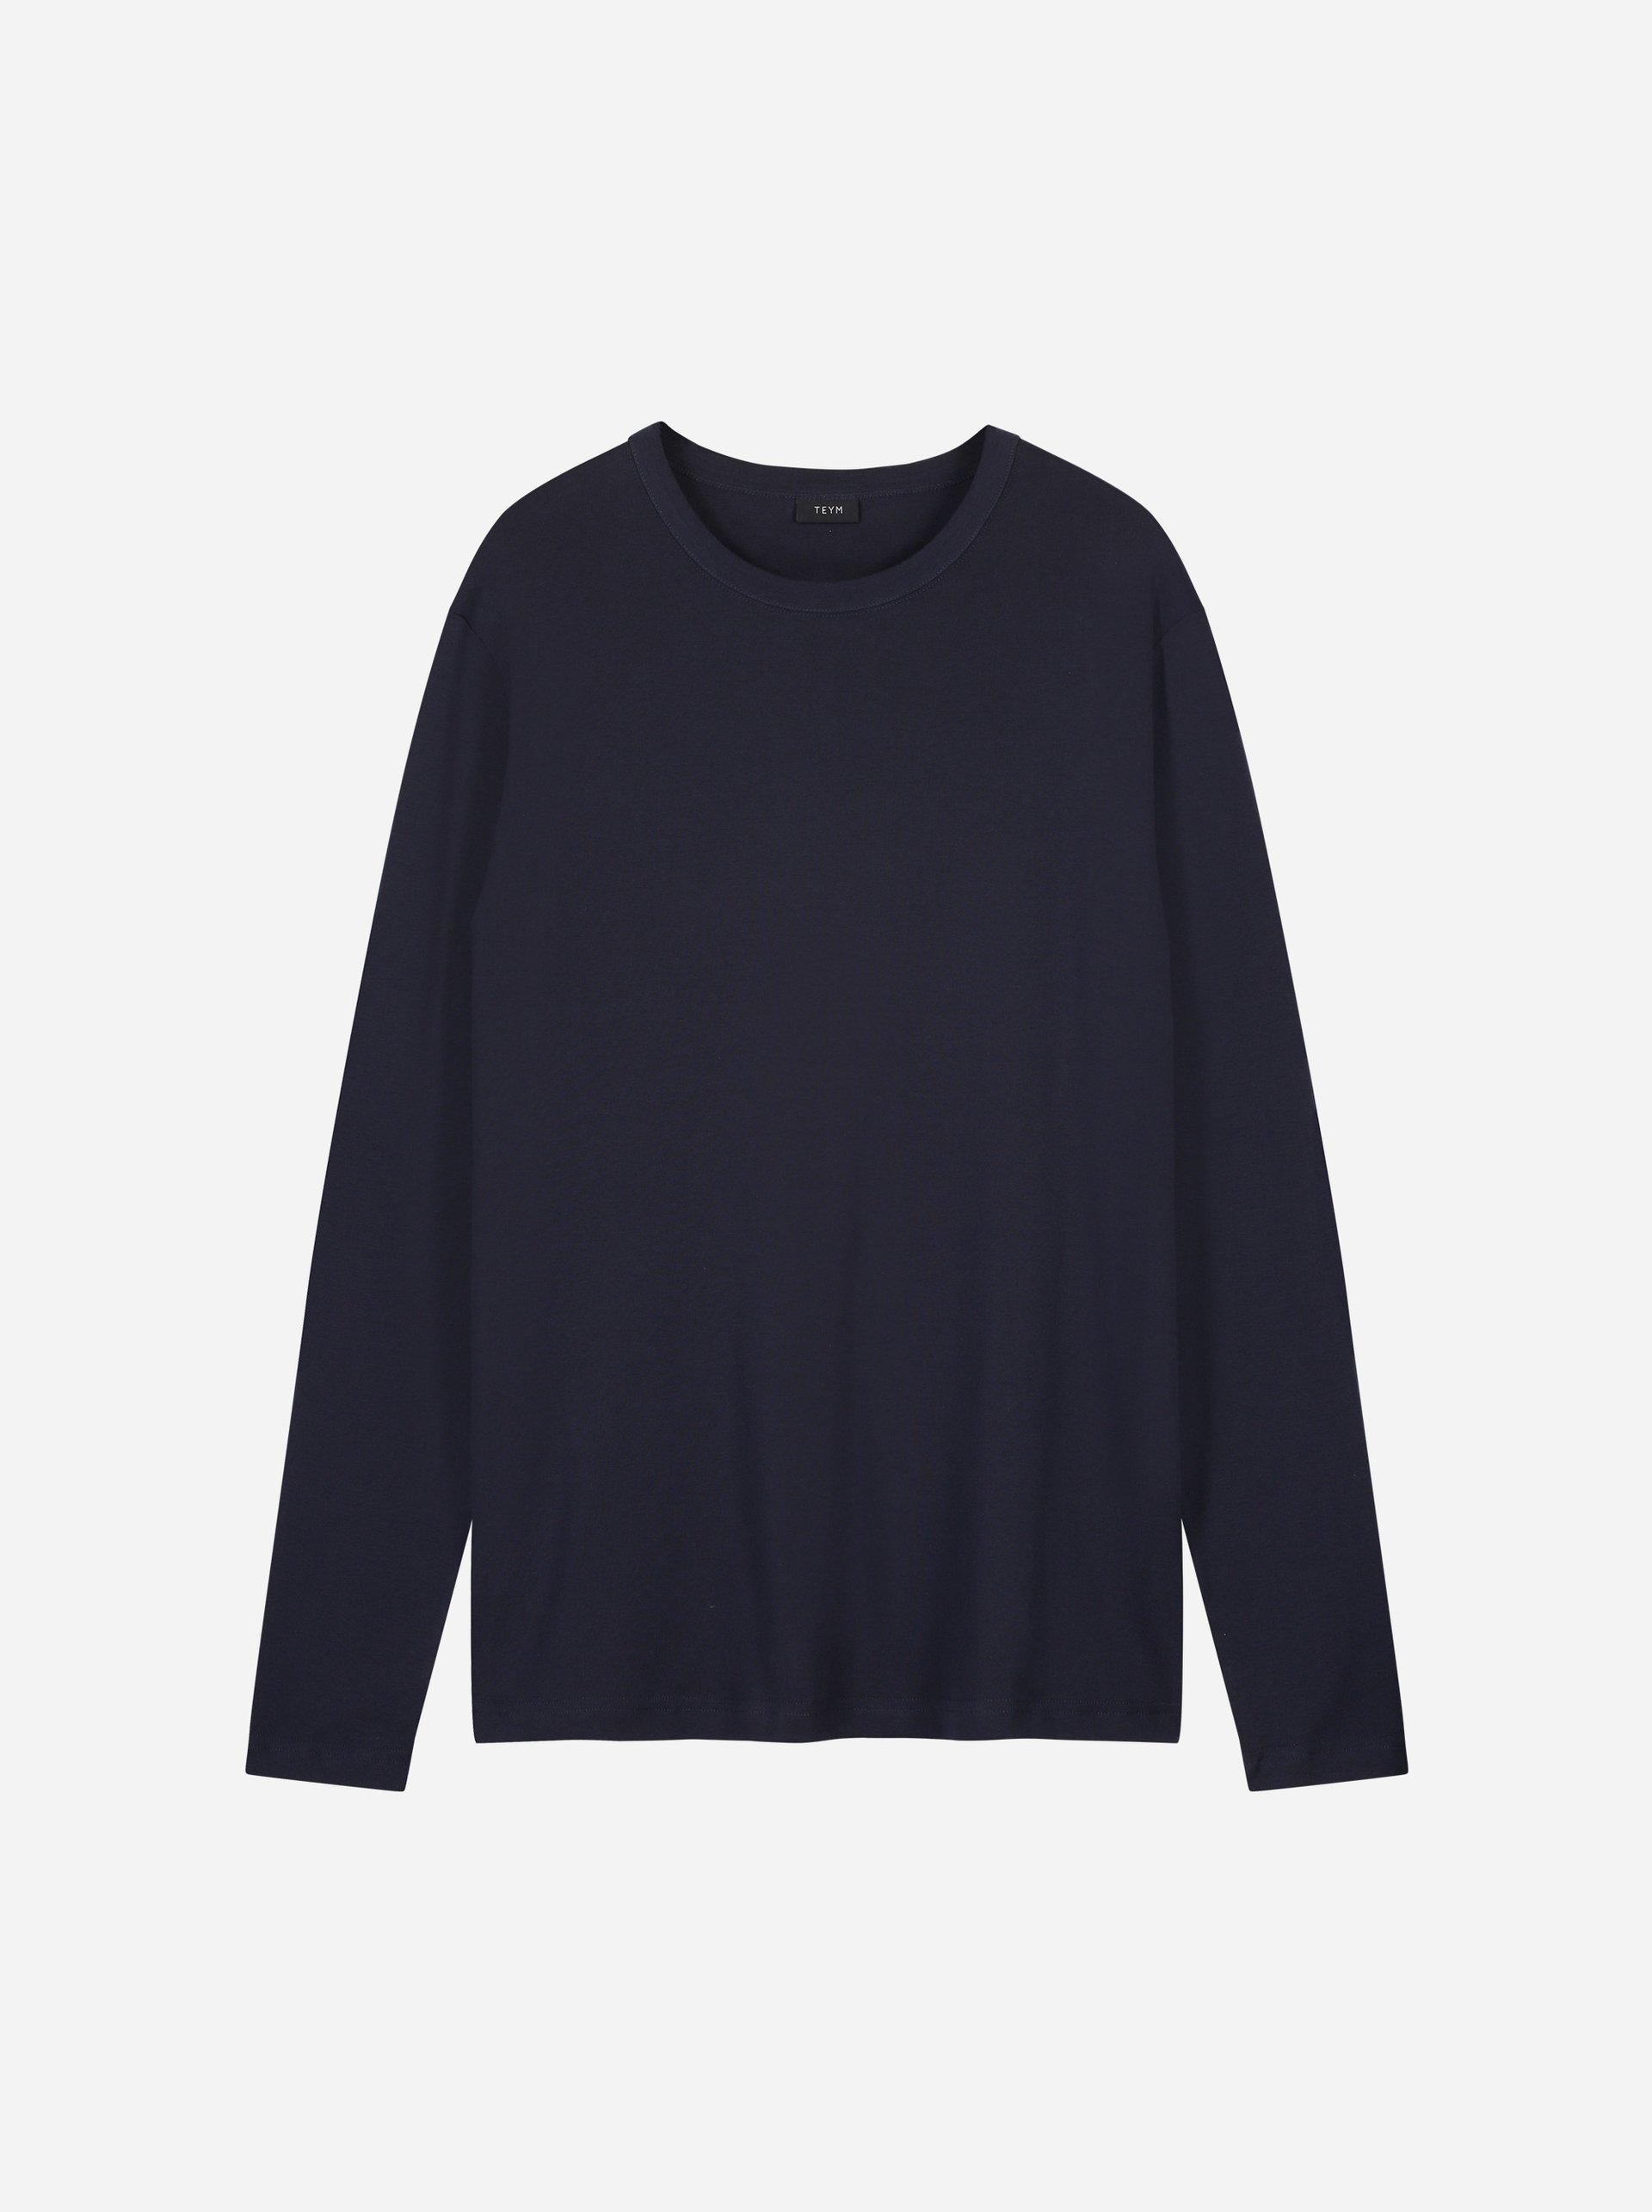 Teym - The-T-Shirt - Longsleeve - Men - Blue - 4